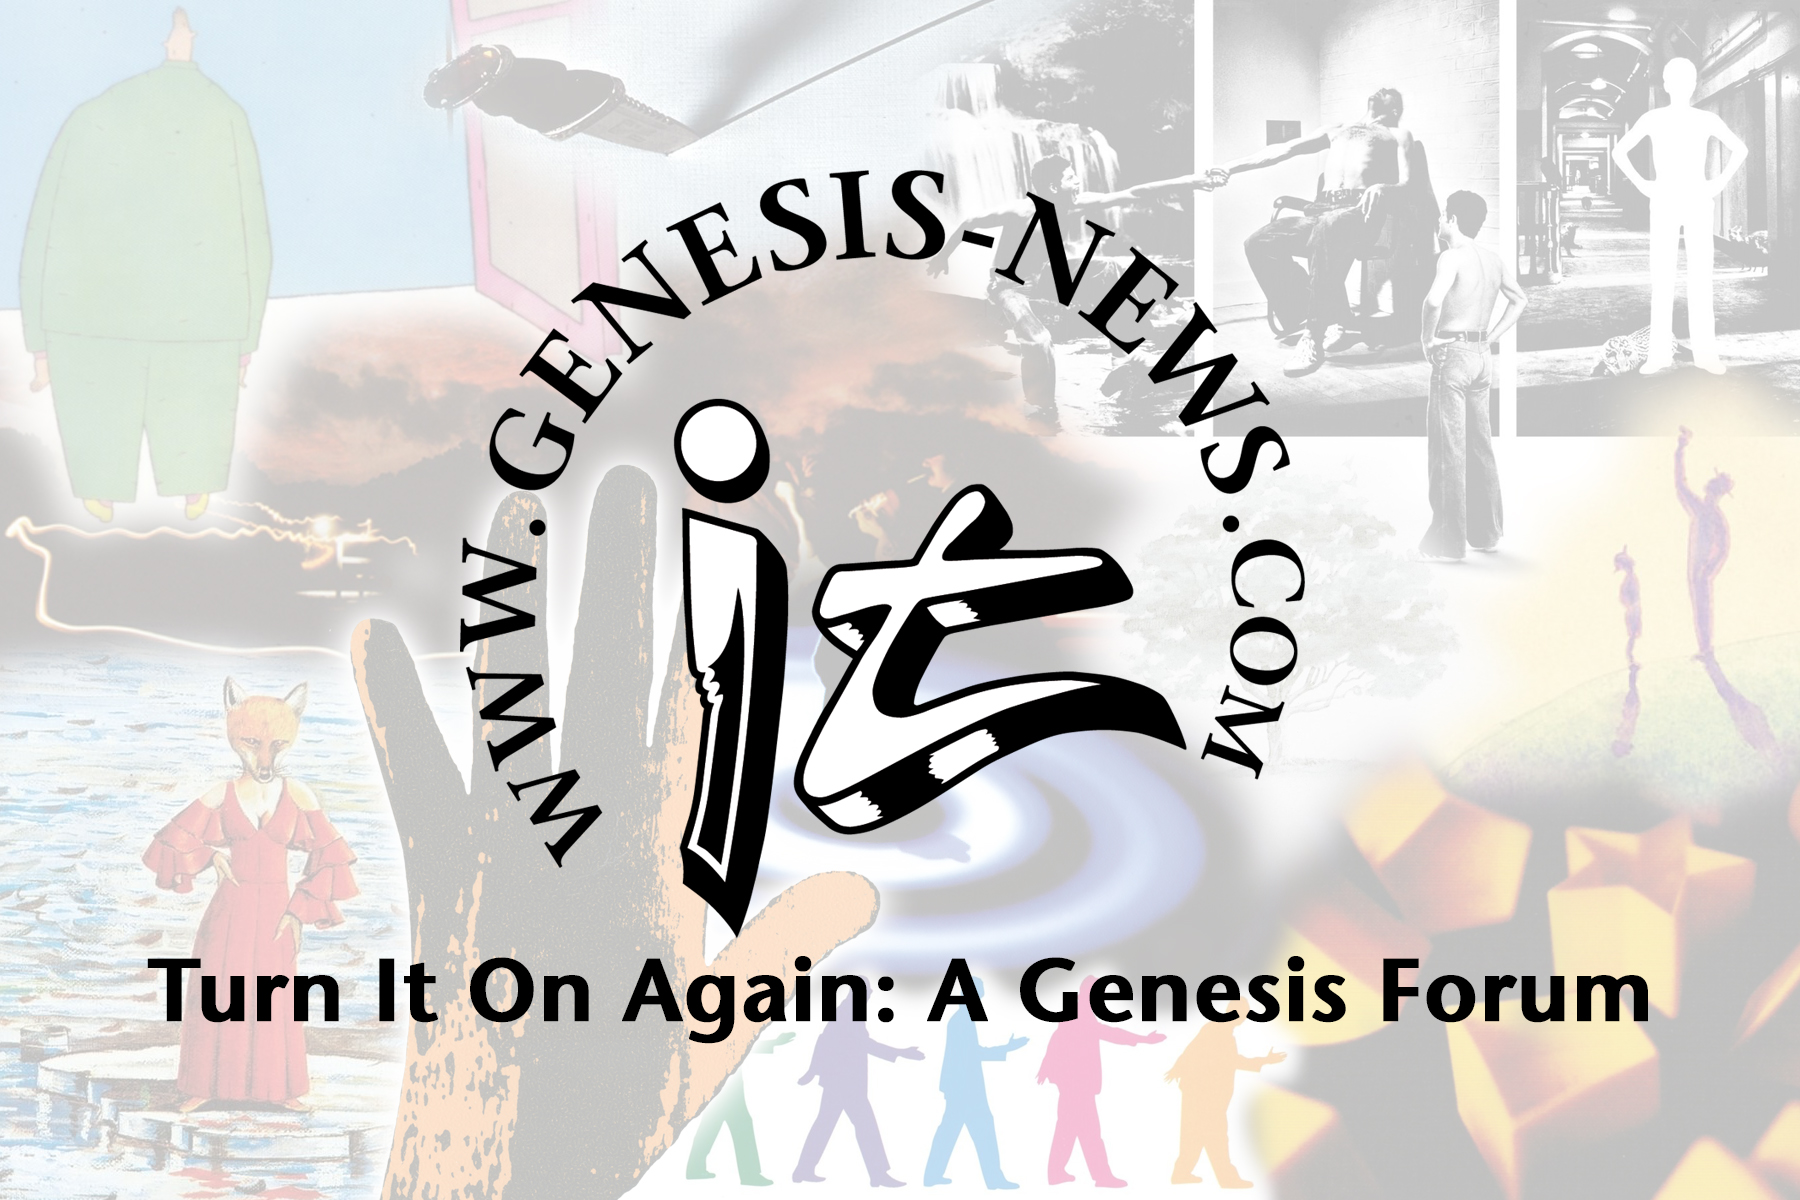 www.genesis-news.com